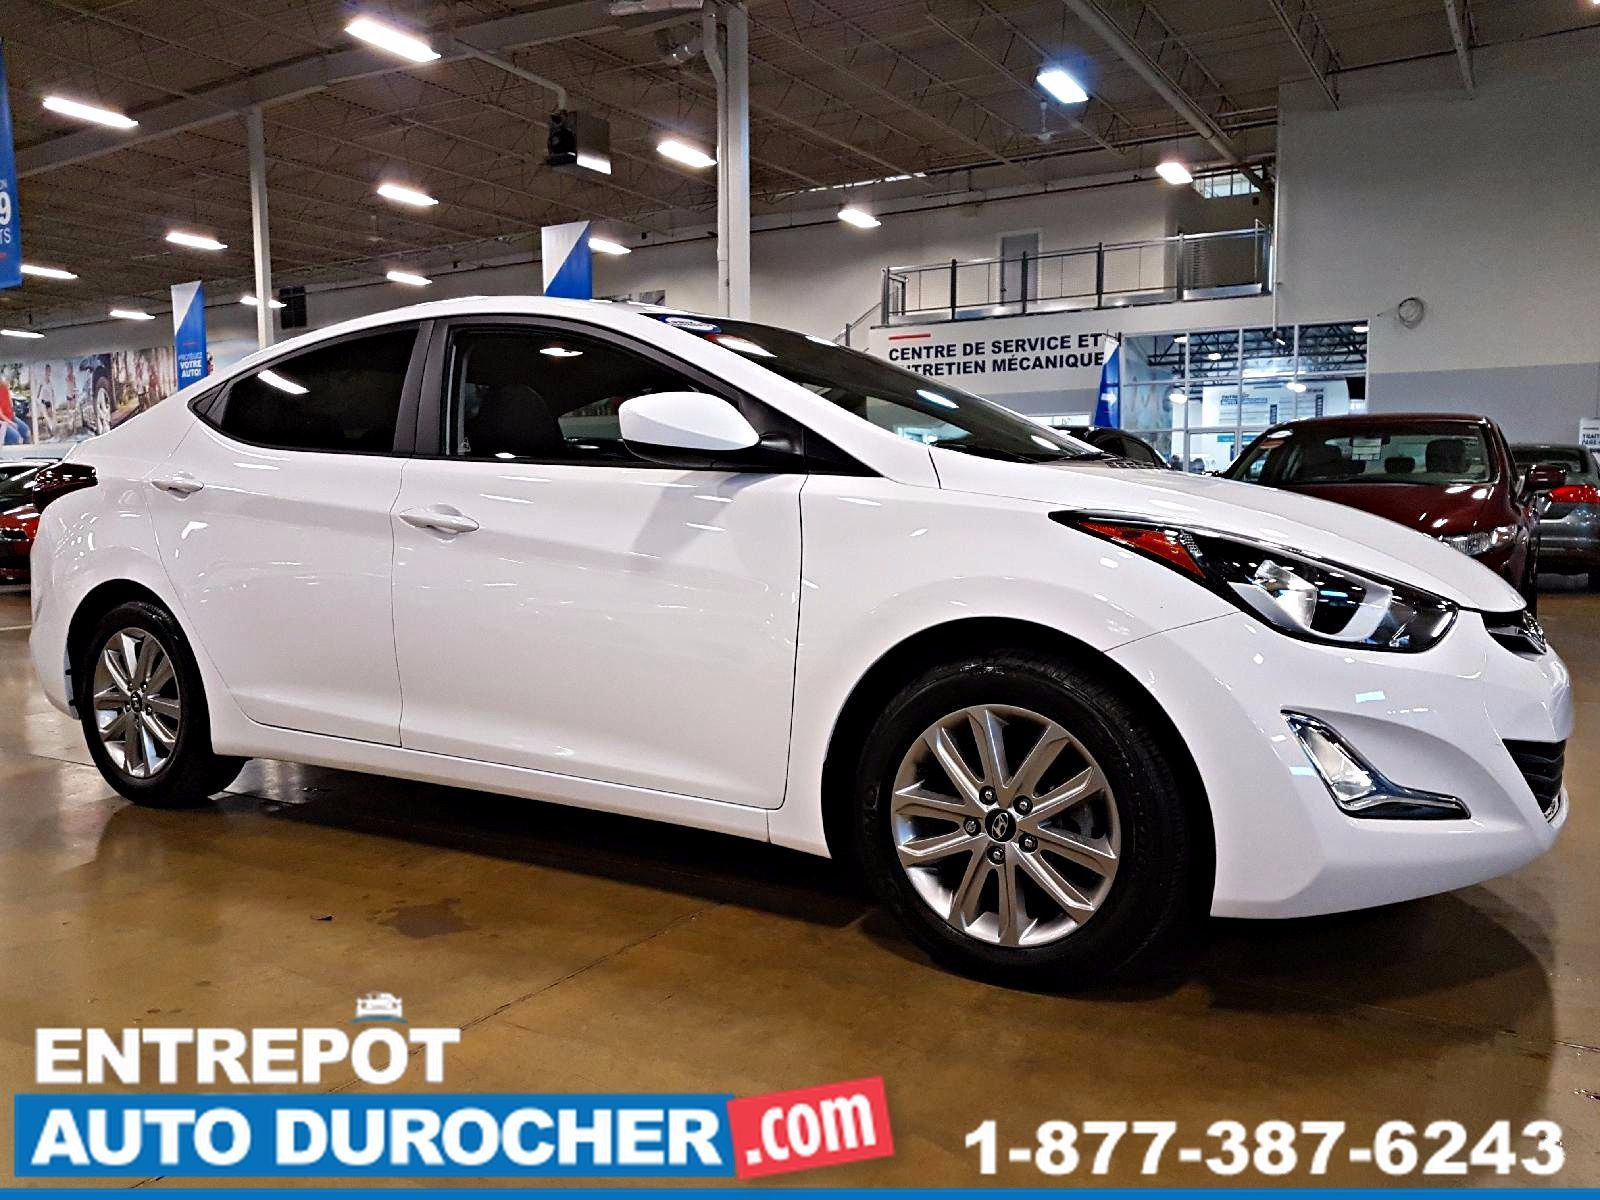 Hyundai Elantra AUTOMATIQUE - AIR CLIMATISÉ - SIÈGES CHAUFFANTS 2016